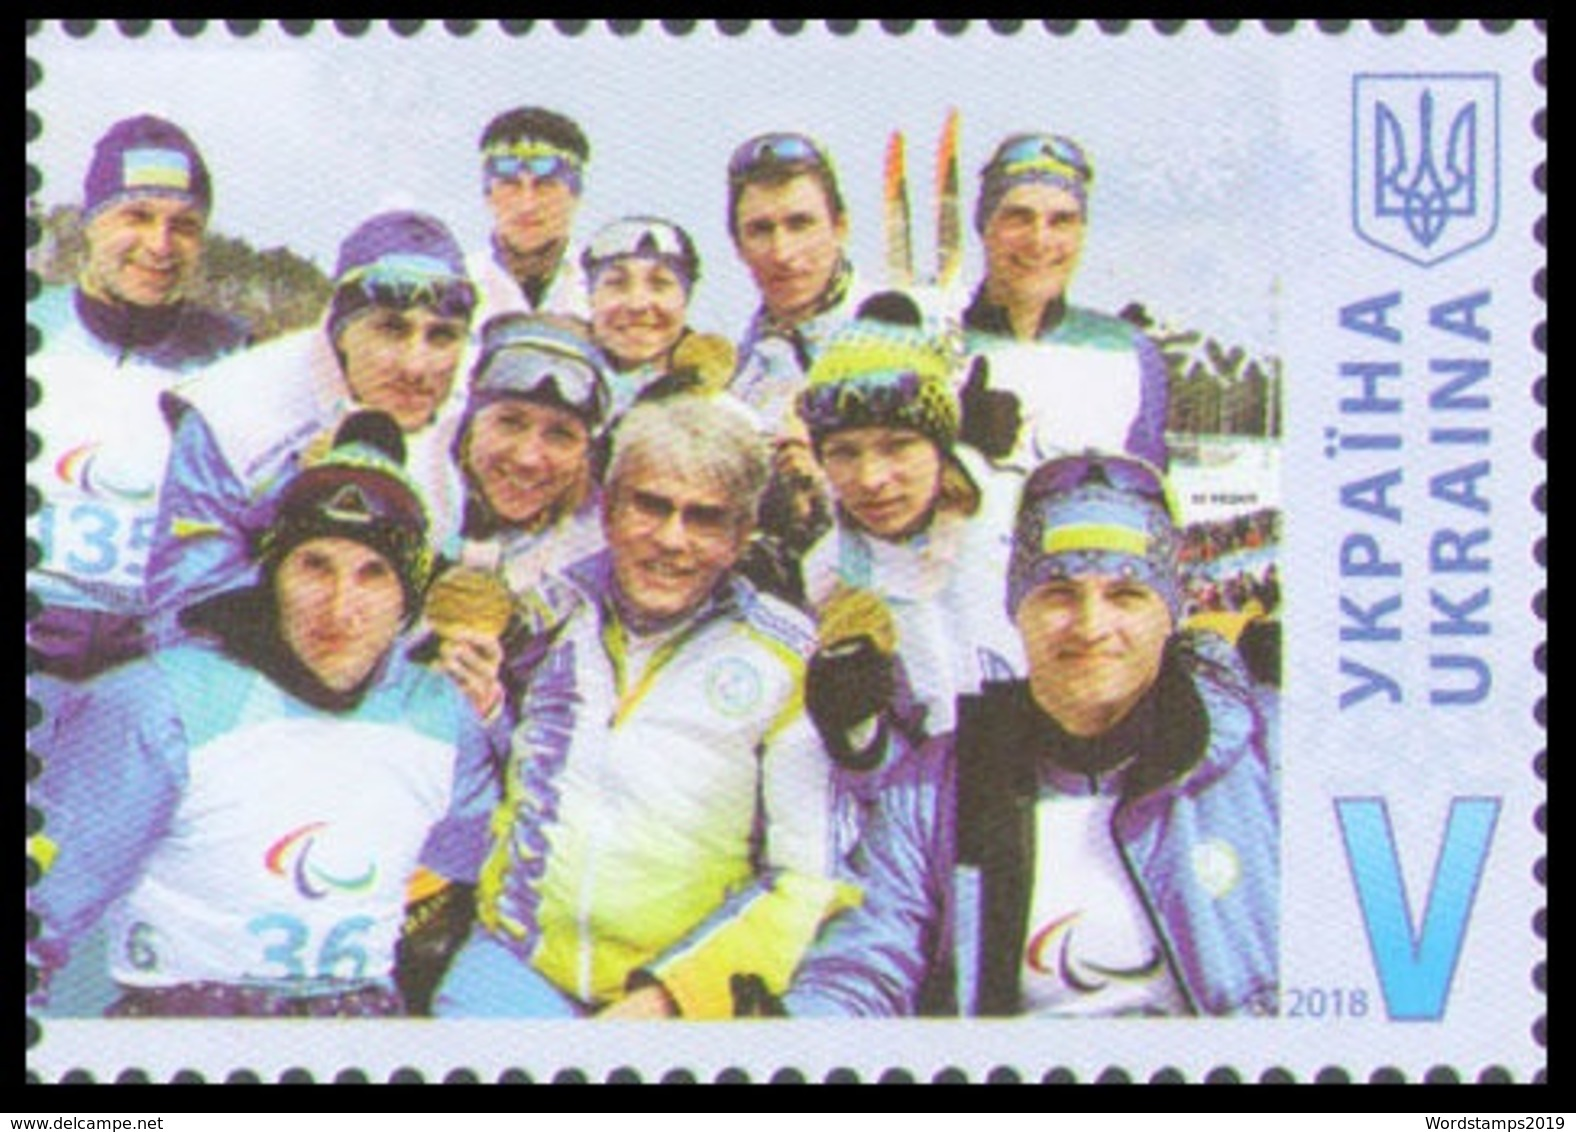 2018Ukraine 1748Ukrainian Paralympics - Winter 2018: Pyeongchang